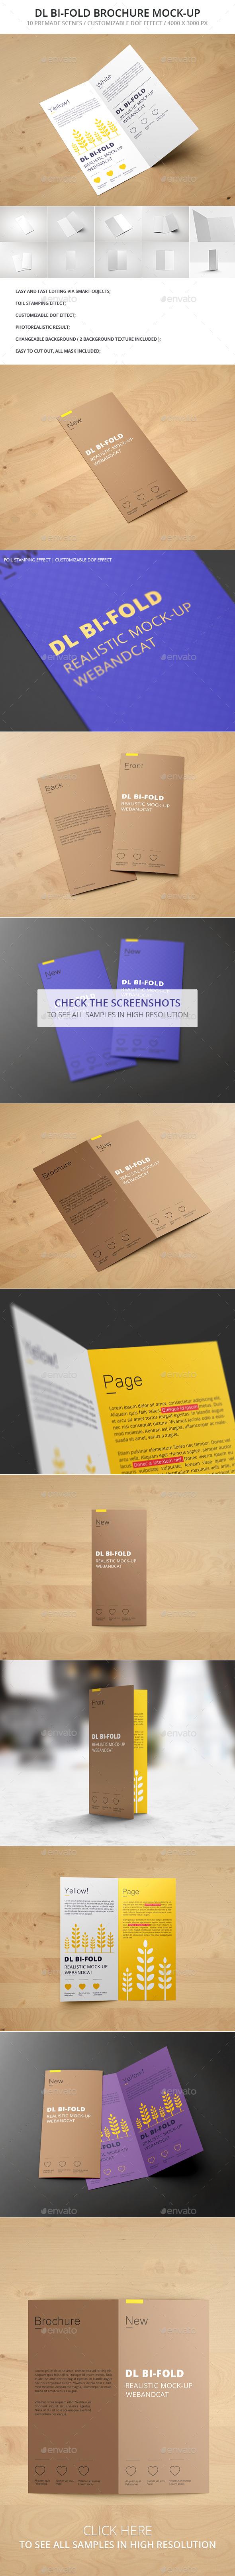 DL Bi-Fold Brochure Mockup - Brochures Print